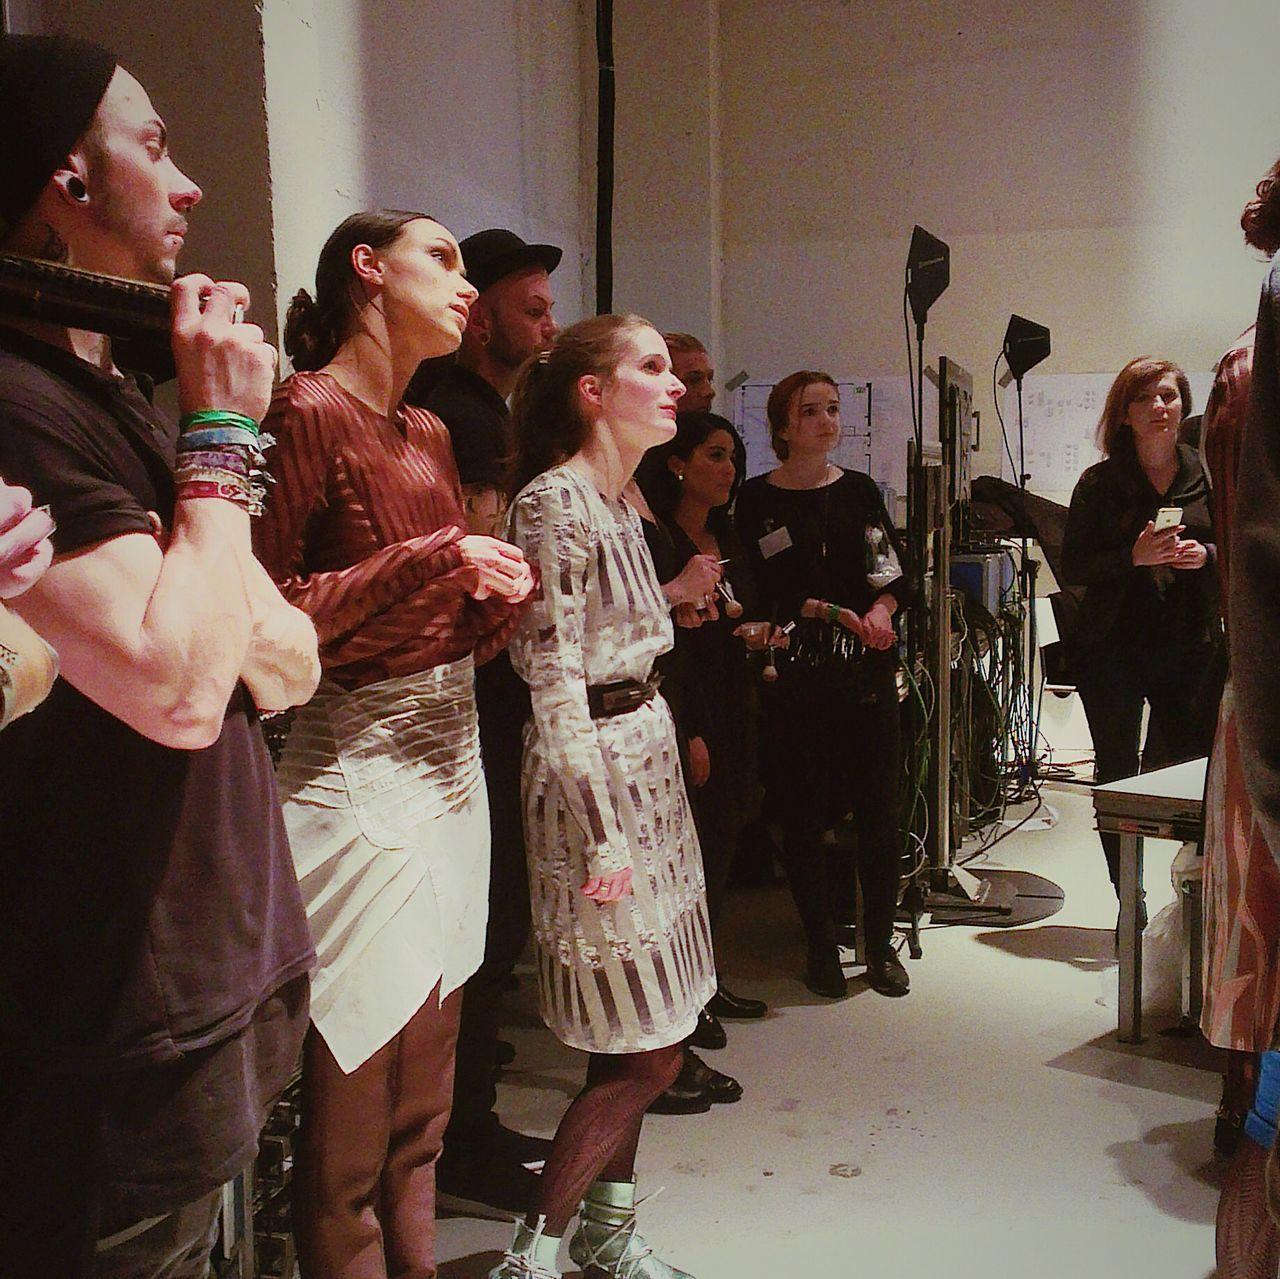 Designer Clara Kaesdorf and Models getting ready for their show at Berlin Fashion Week Fashionweek 2015 Berlin ClaraKaesdorf Sustainability Urban Style Fashion Design Runway